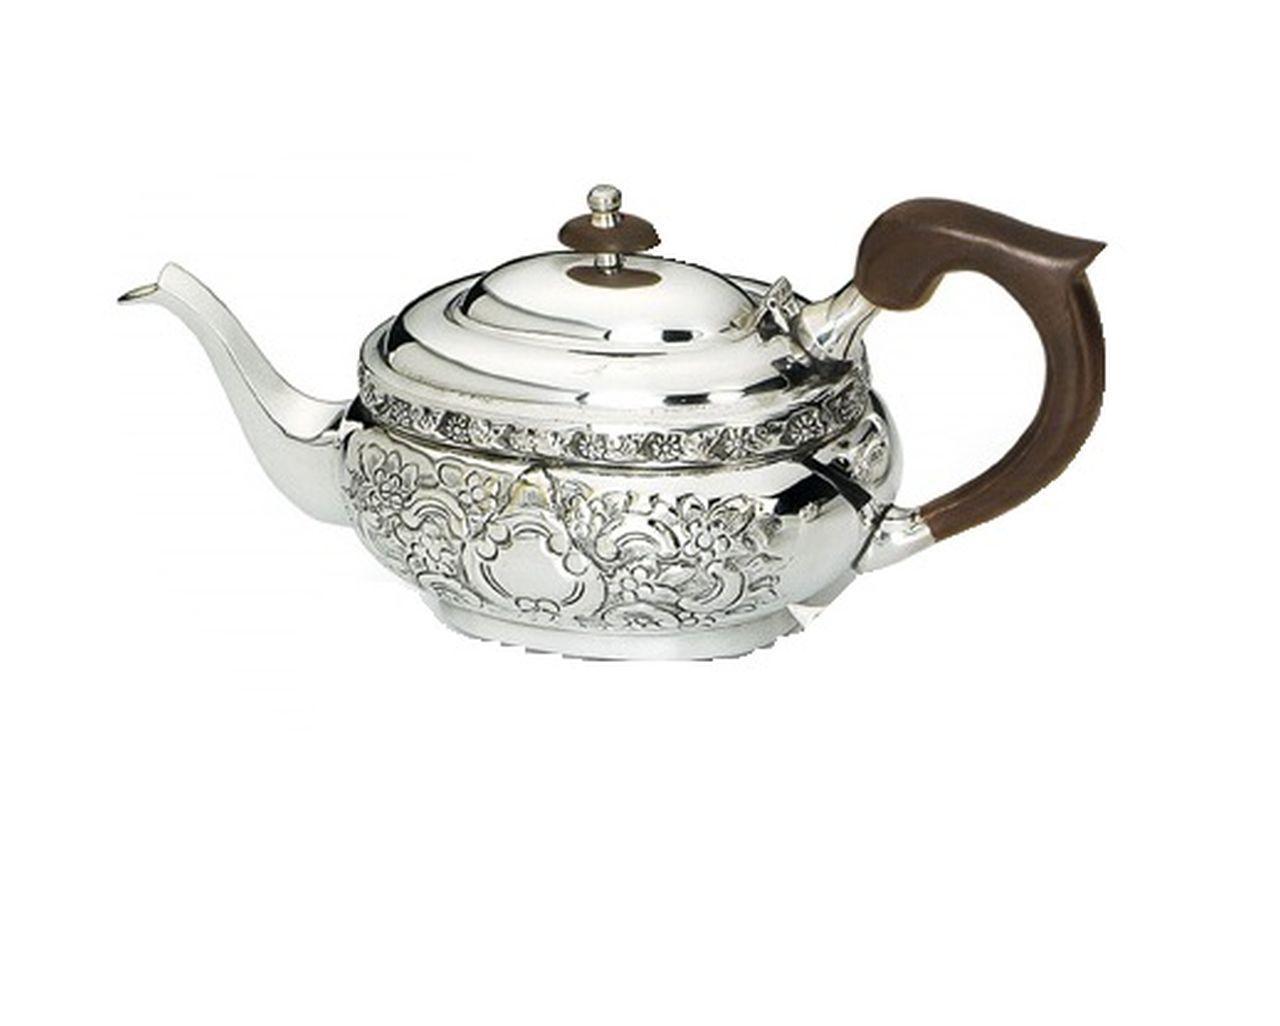 Teiera argentato argento sheffield stile cesellato